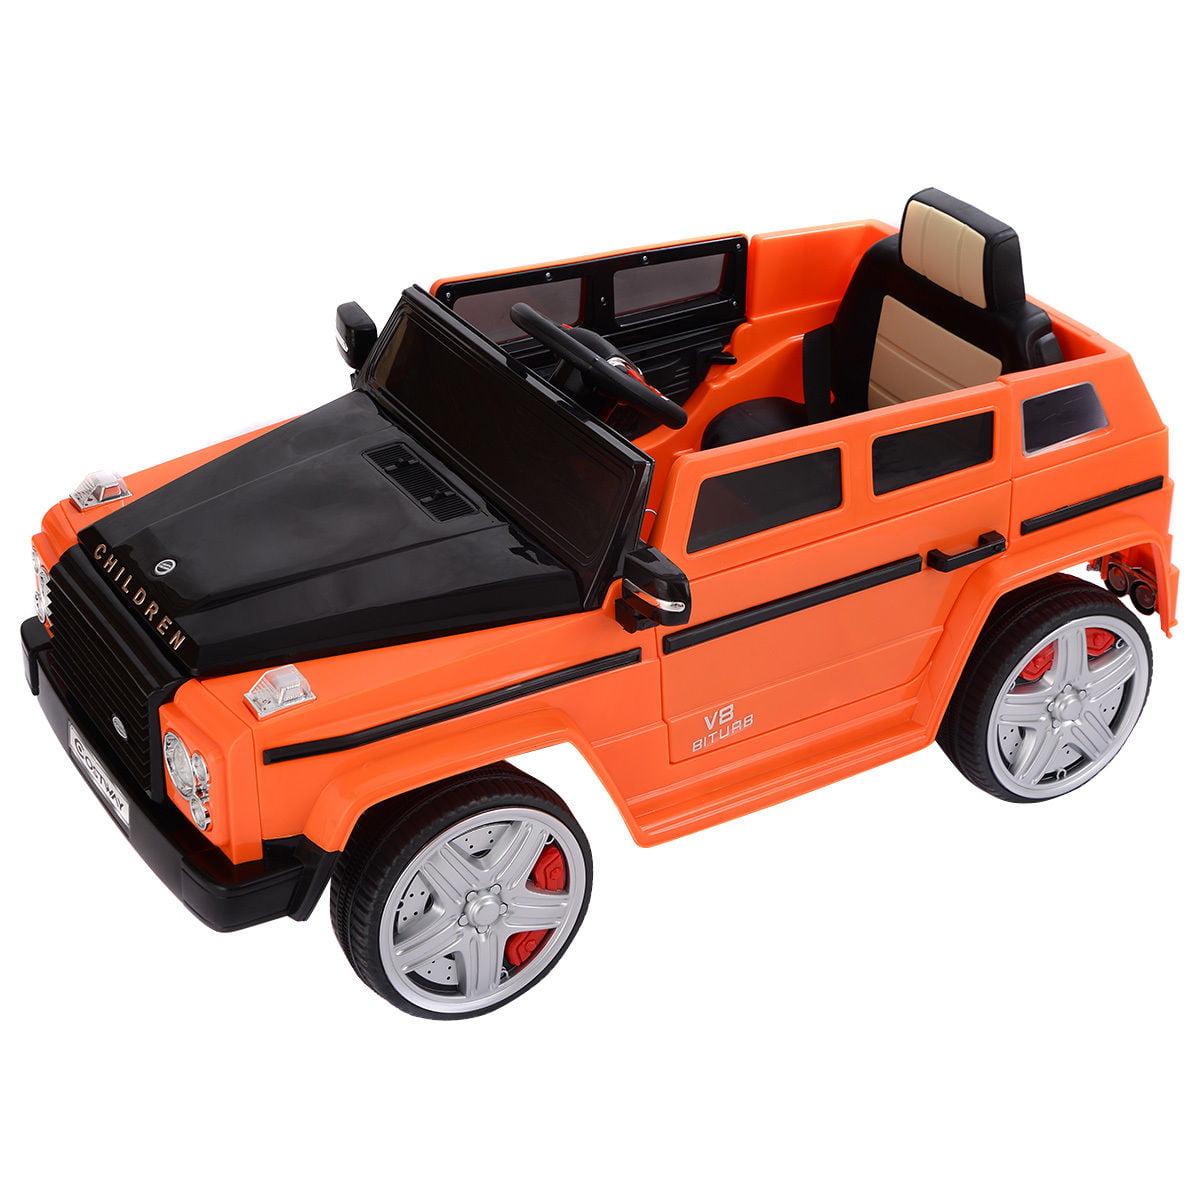 "GHP Kids Orange 43""Lx26""Wx21""H Battery Powered Ride On Car w LED Lights & MP3 Aux"